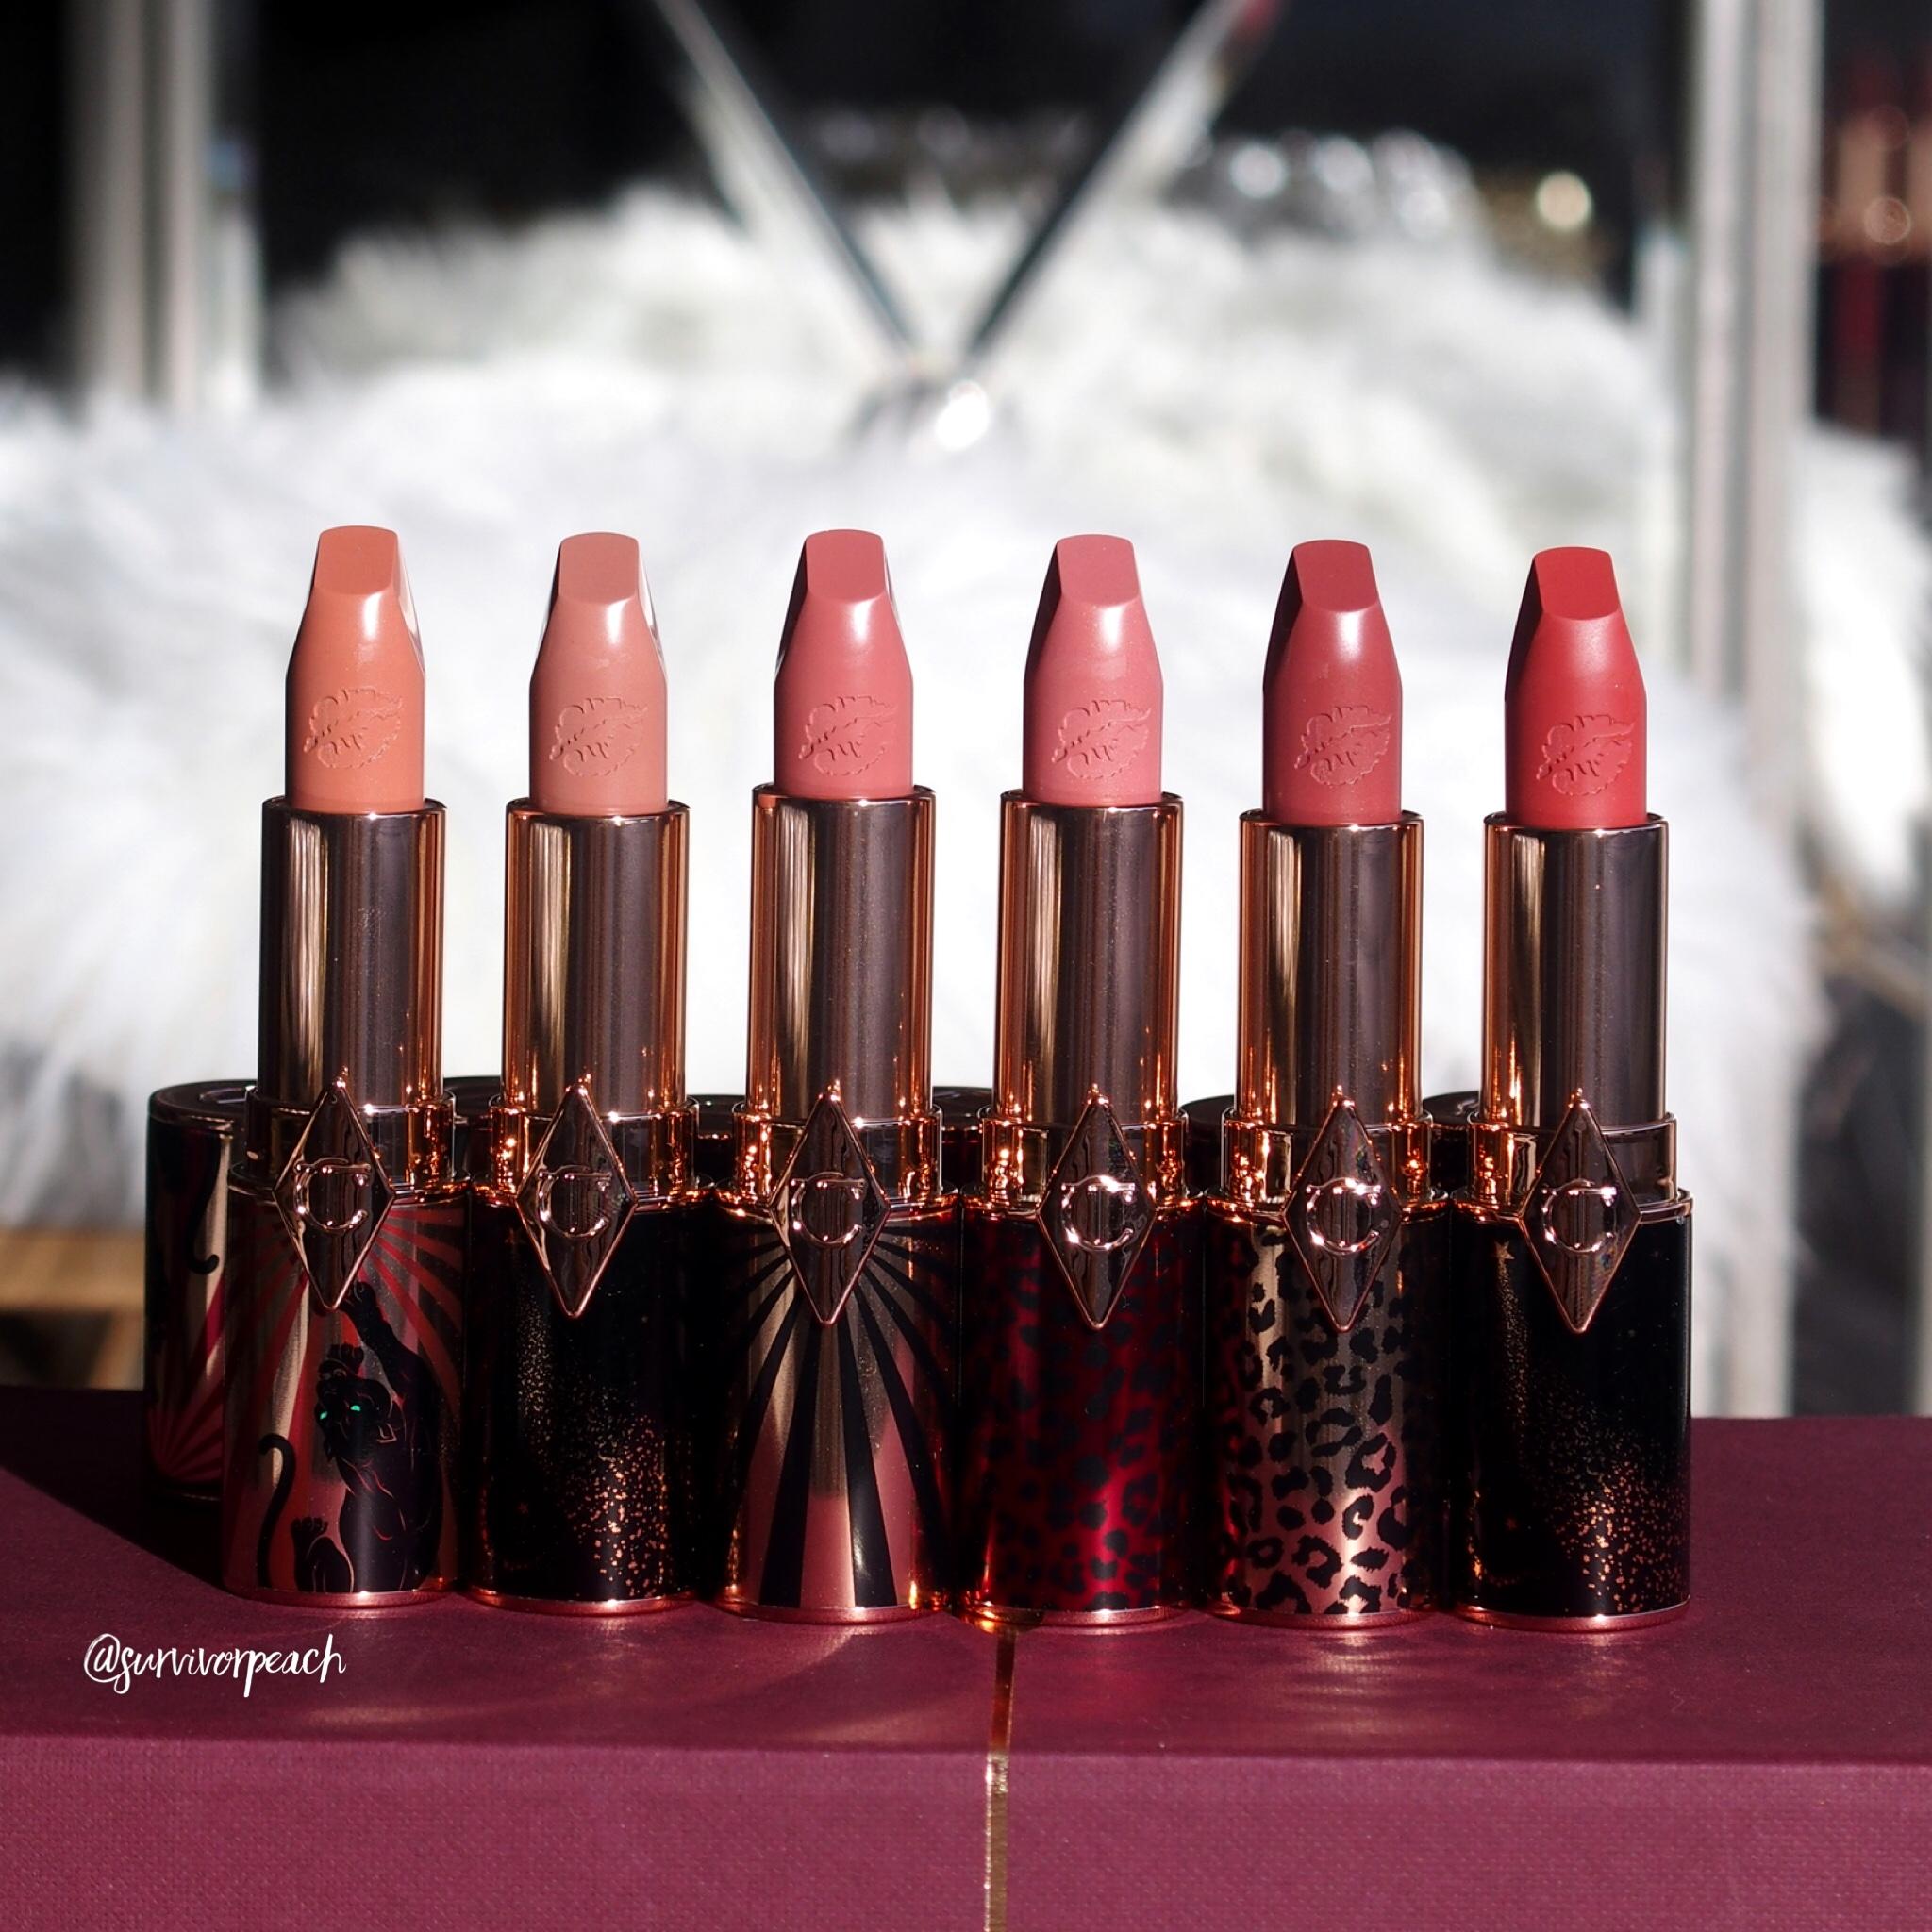 Charlotte Tilbury Hot Lips 2 Refillable - Angel Alessandra, JK Magic, In Love With Olivia, Dancefloor Princess, Carina's Star, and Glowing Jen